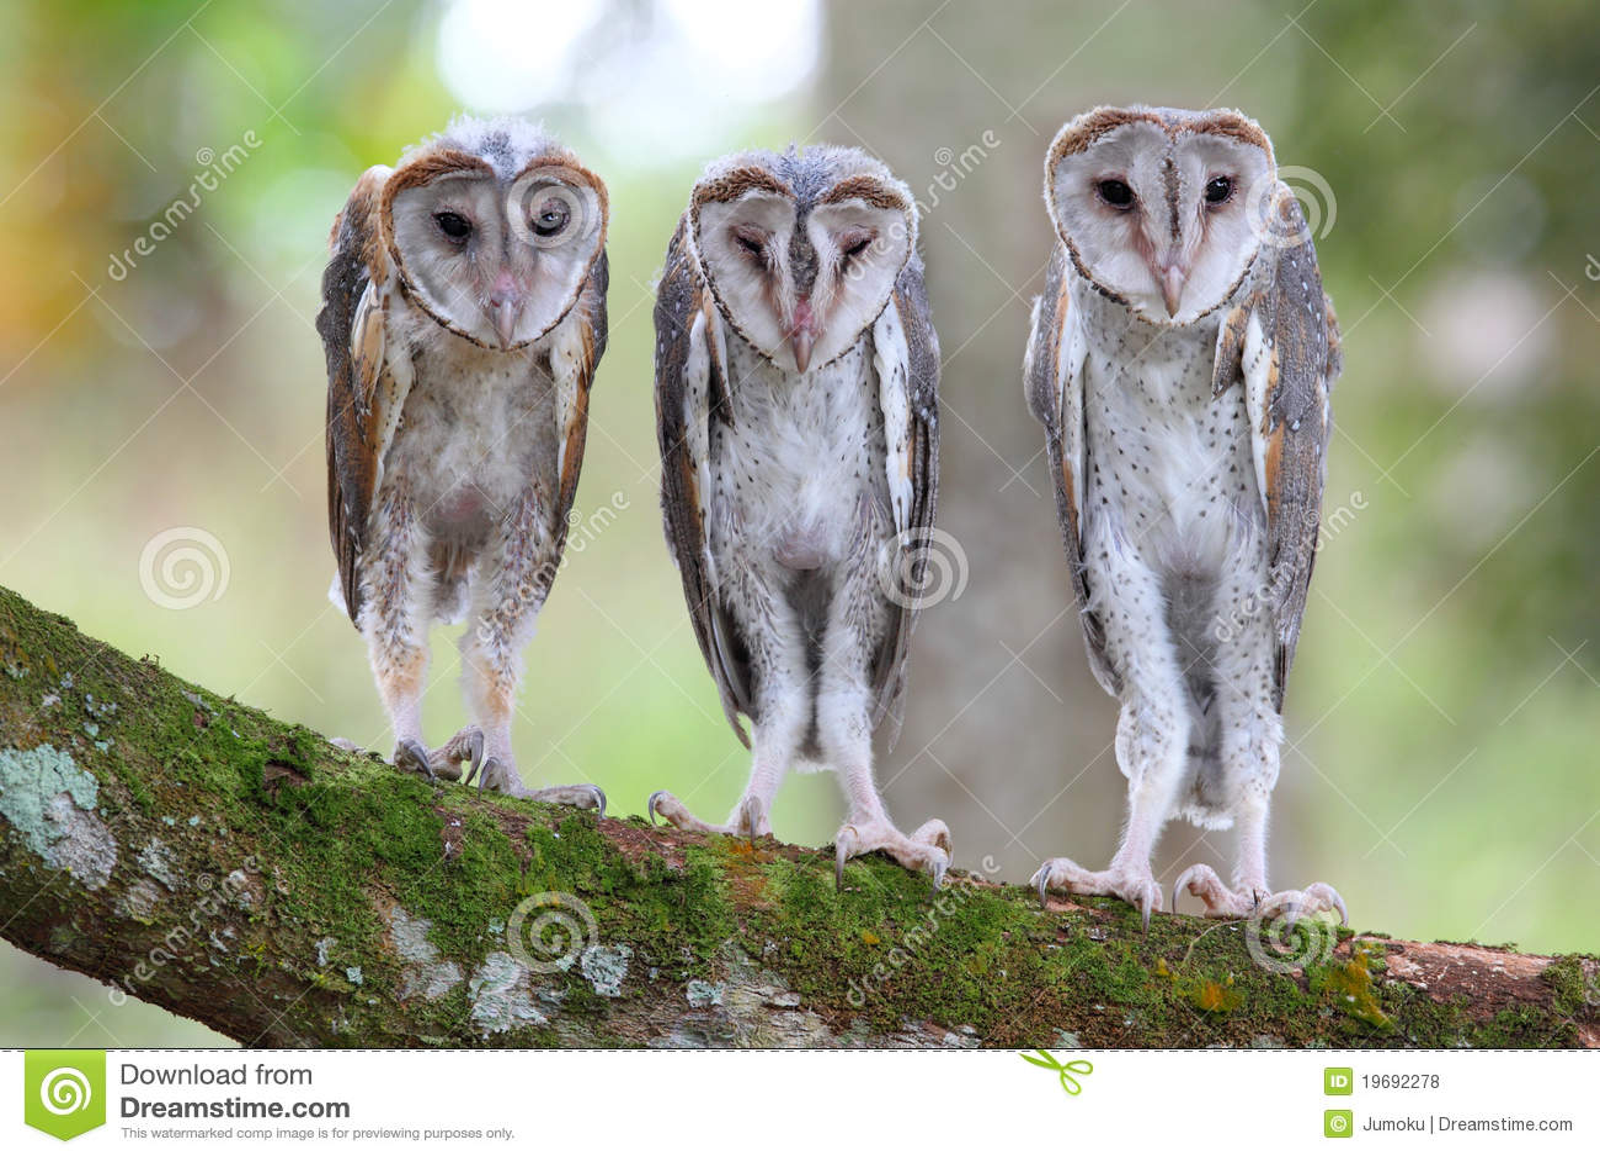 Baby Barn Owl Royalty Free Stock Photos Image 19692278